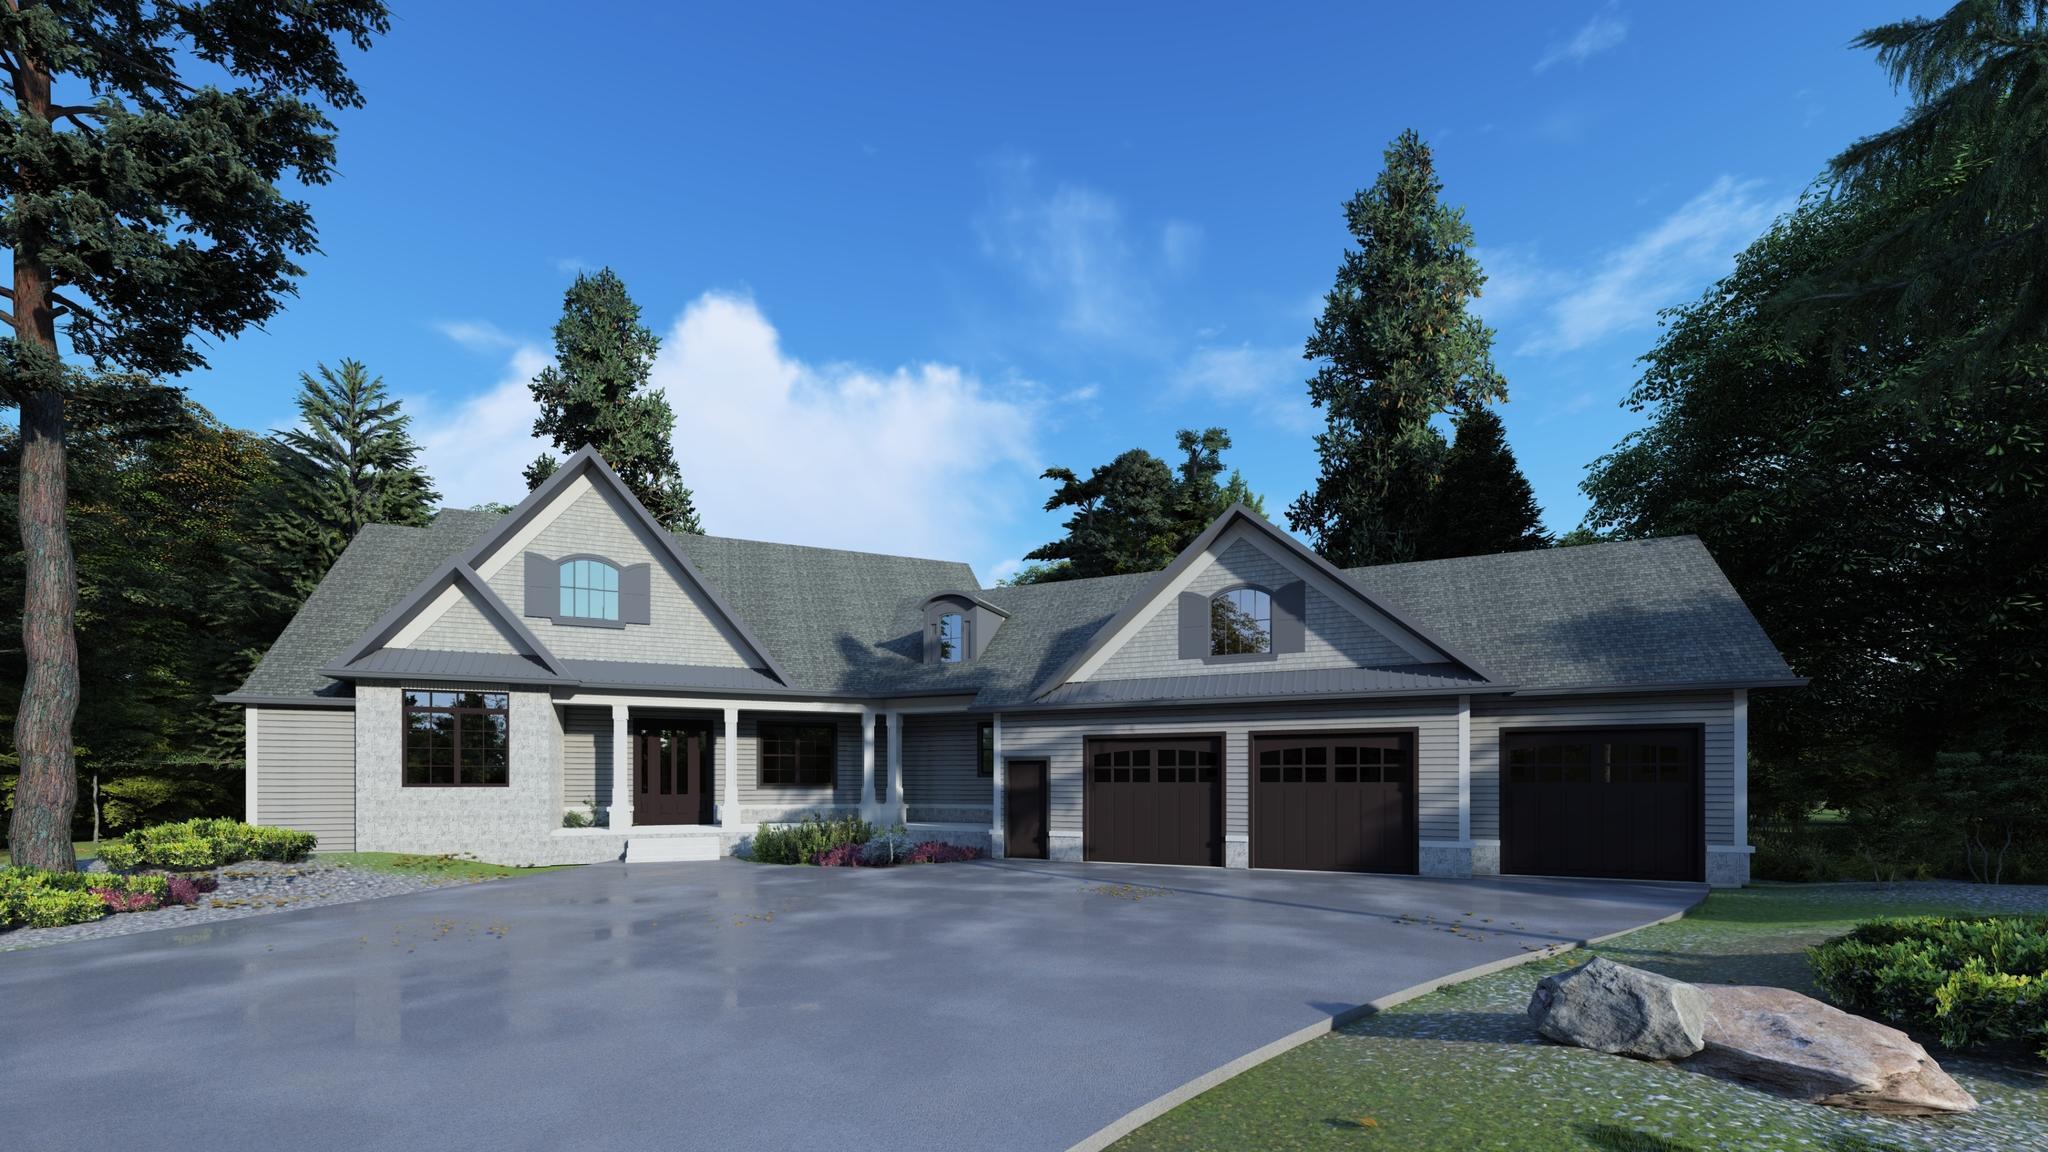 1005 Applewood Court Property Photo - Mankato, MN real estate listing